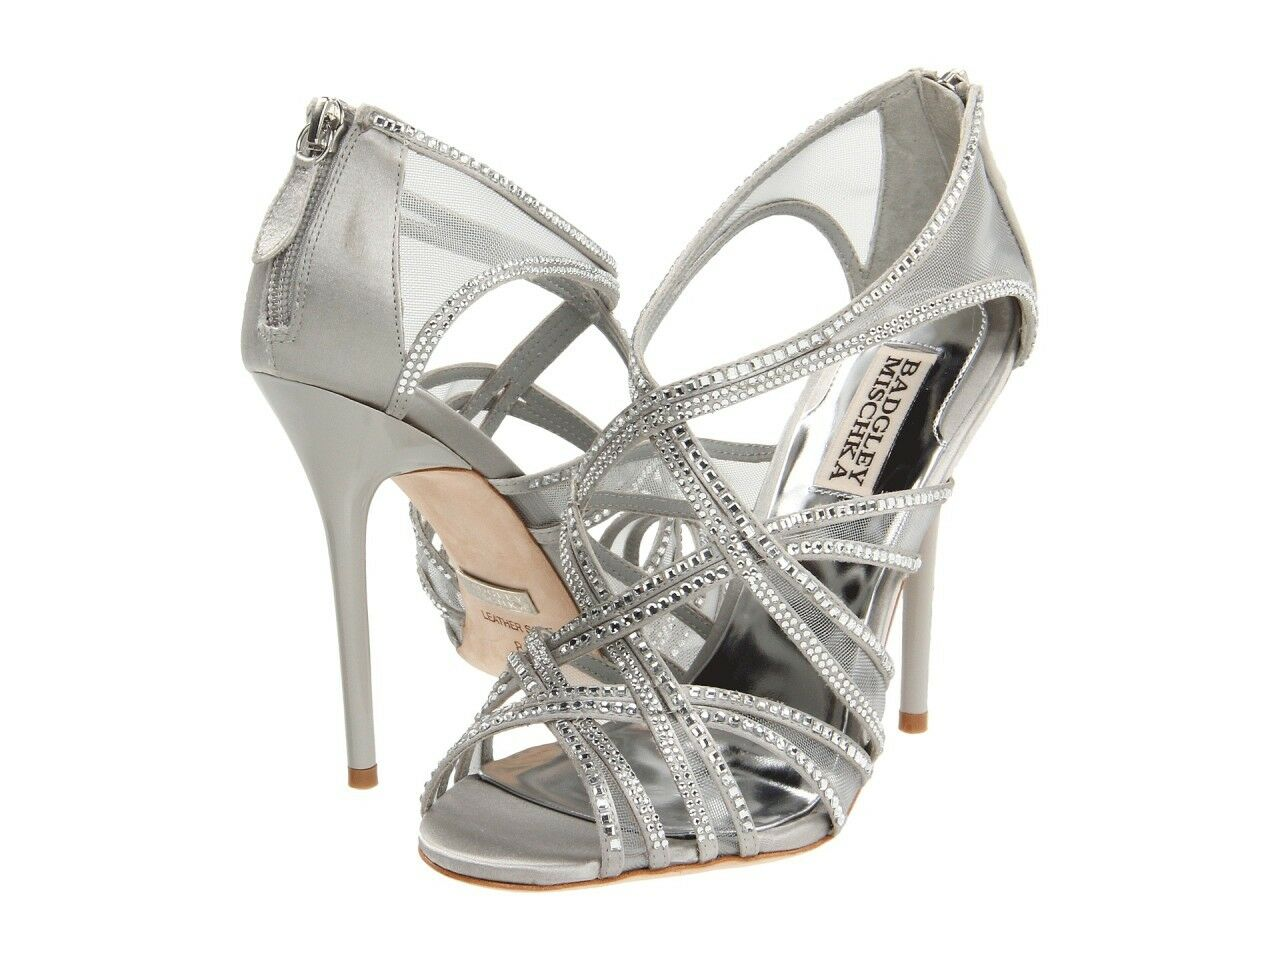 Badgley Mischka Gloria Sandal Grey Silver Heel Jeweled Crystals Float Shoes NEW